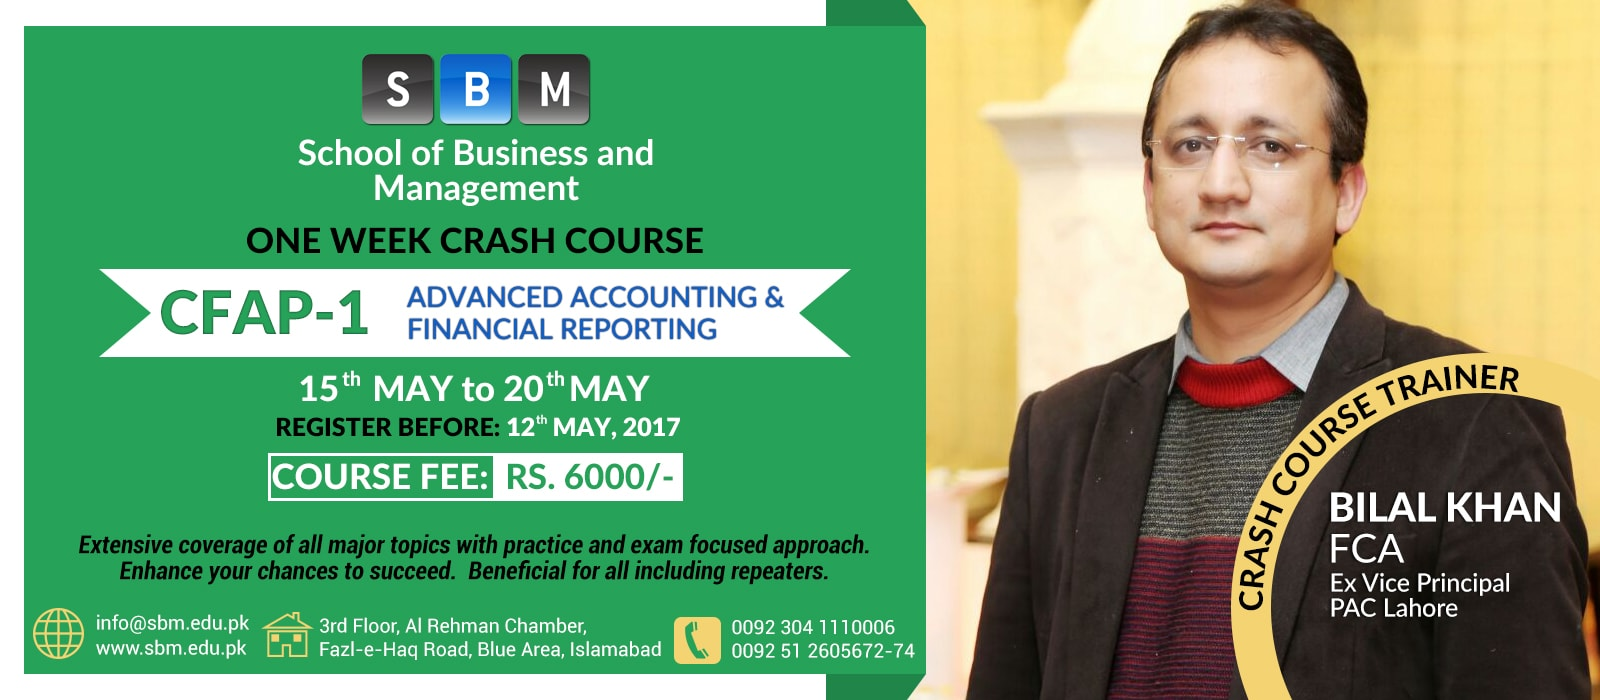 SBM is commencing Crash Course of CFAP1